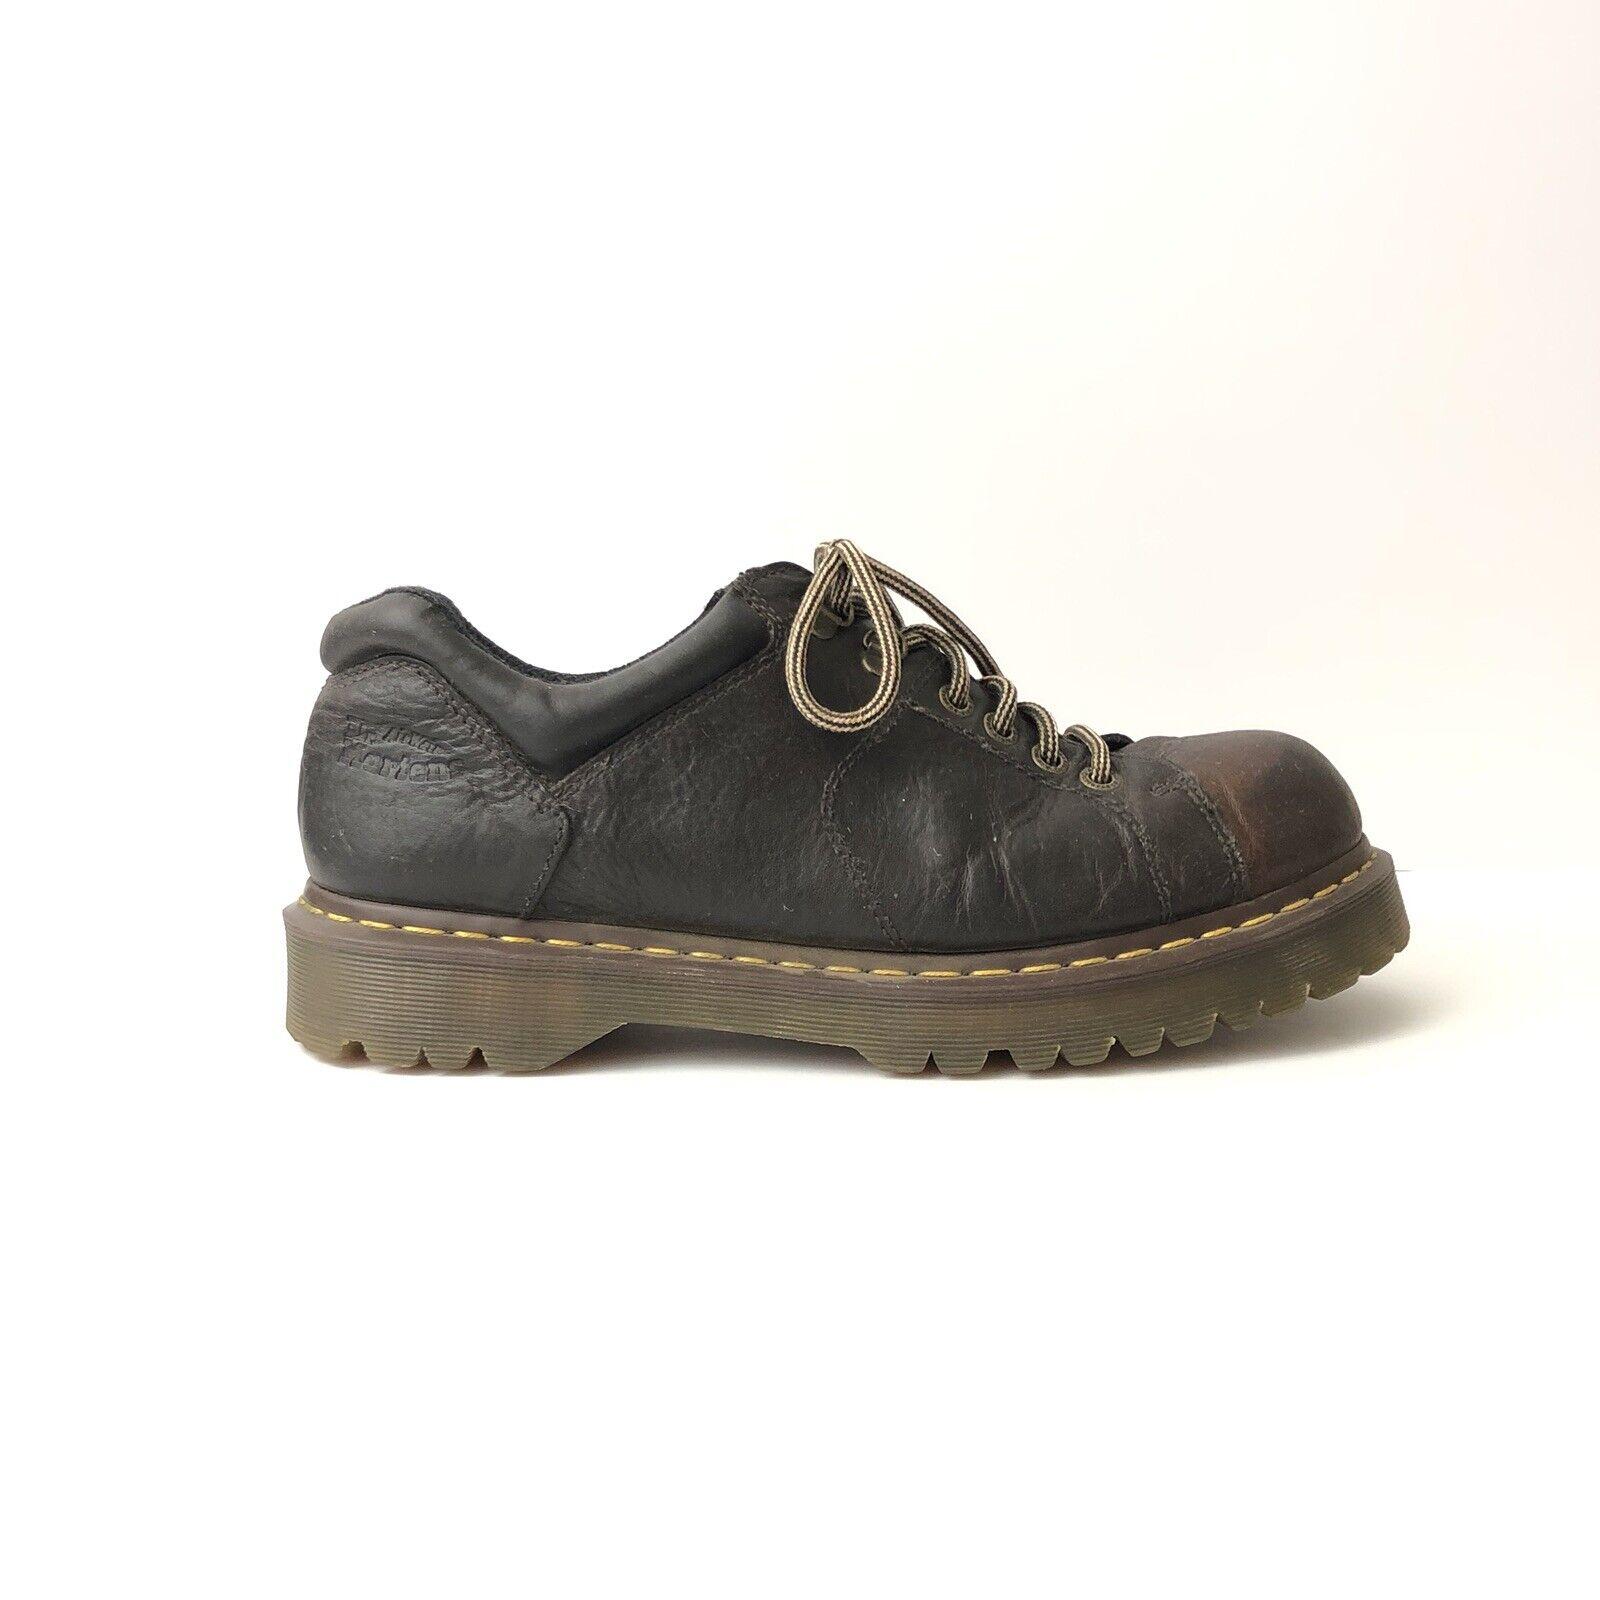 Dr Martens Mens shoes Size 12UK 13US 47EU Brown 8312 Aircushion